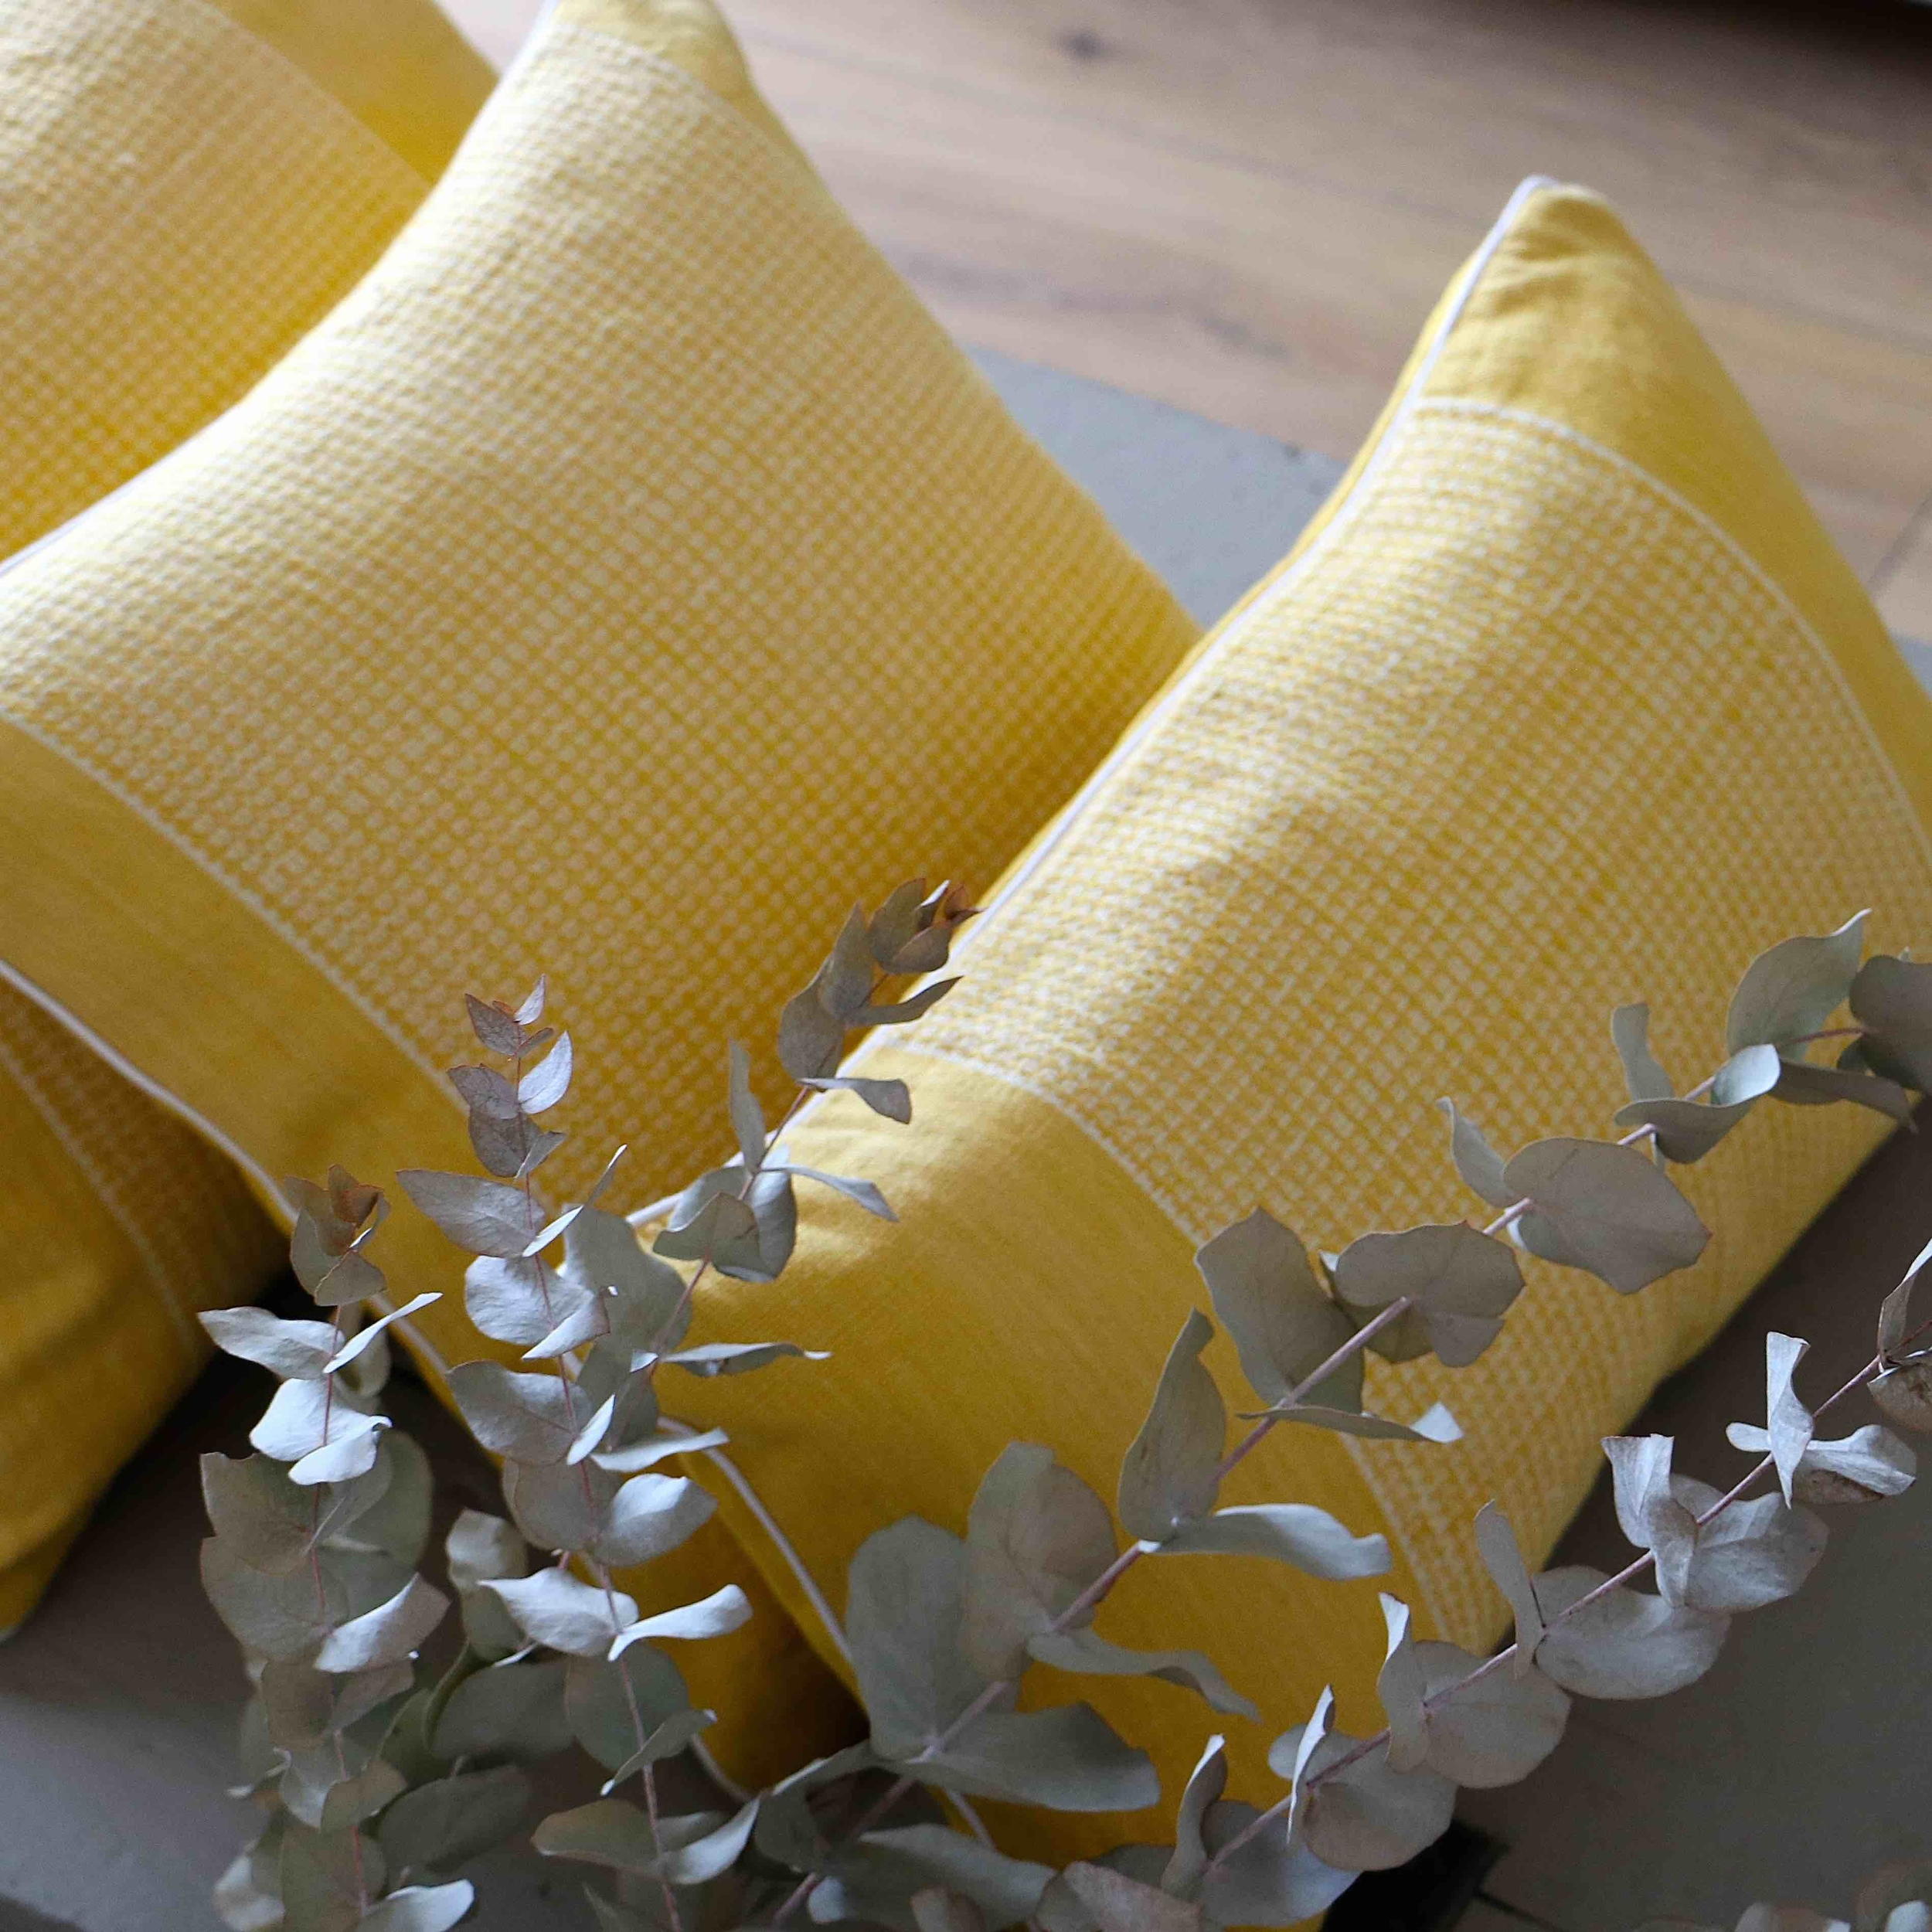 coussin-jaune-trendethics-cils-5-1